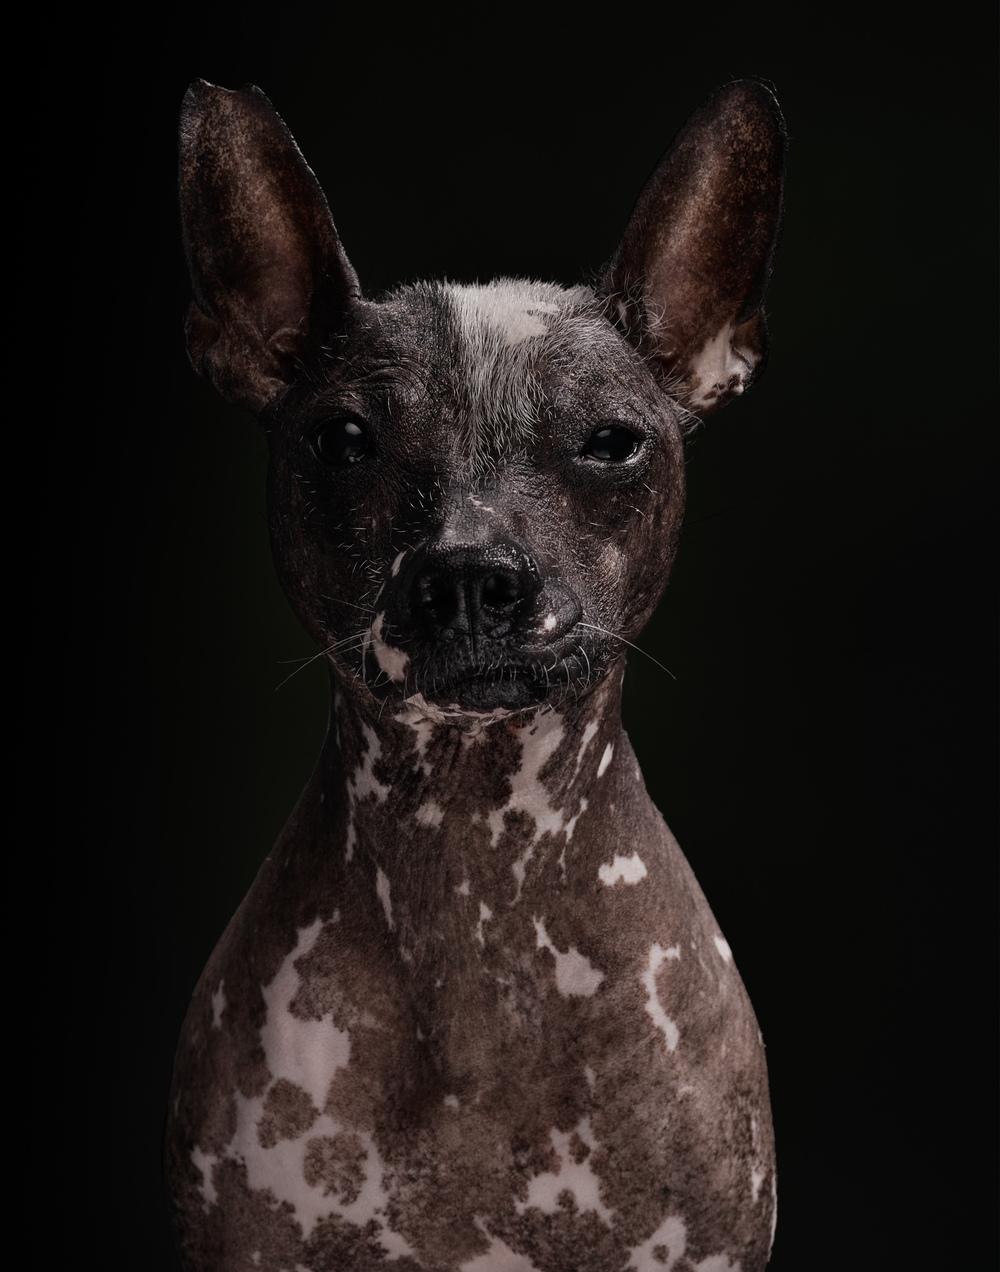 naked-dogs-klausdyba-24.jpg